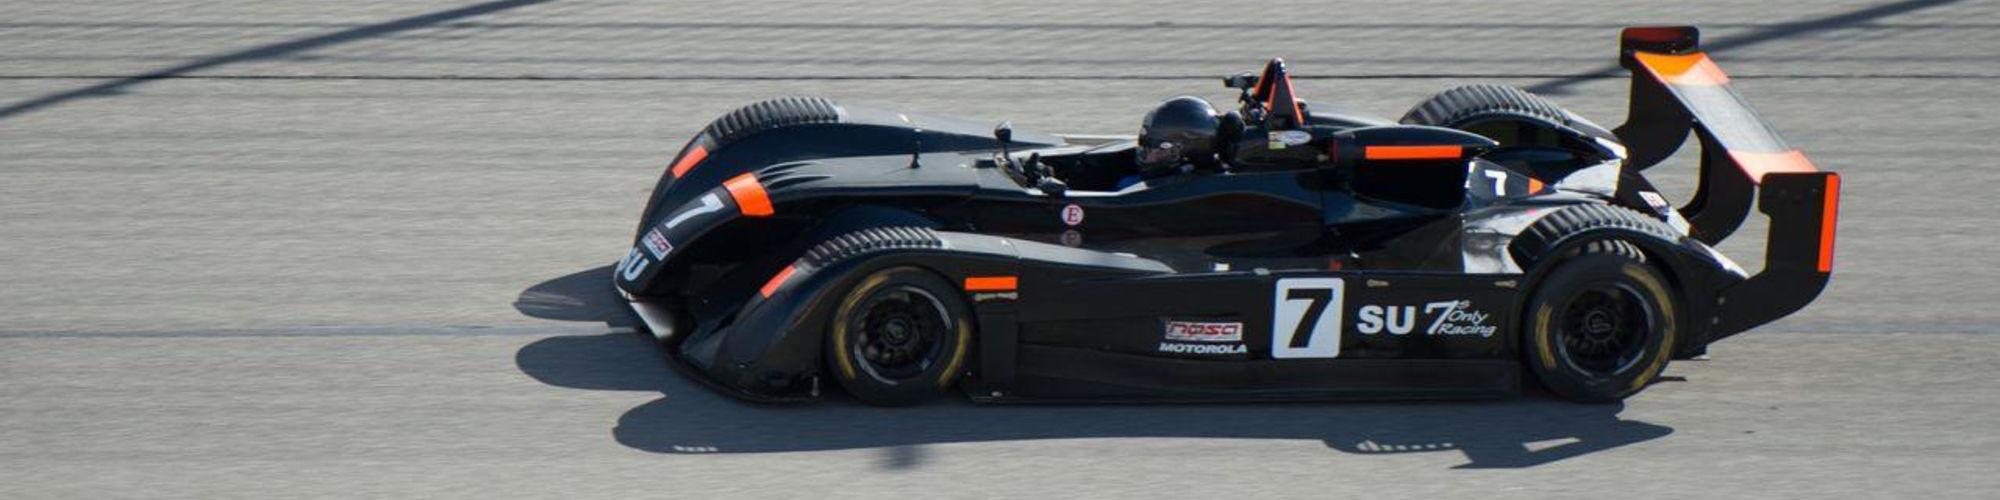 7s Only Racing, LLC